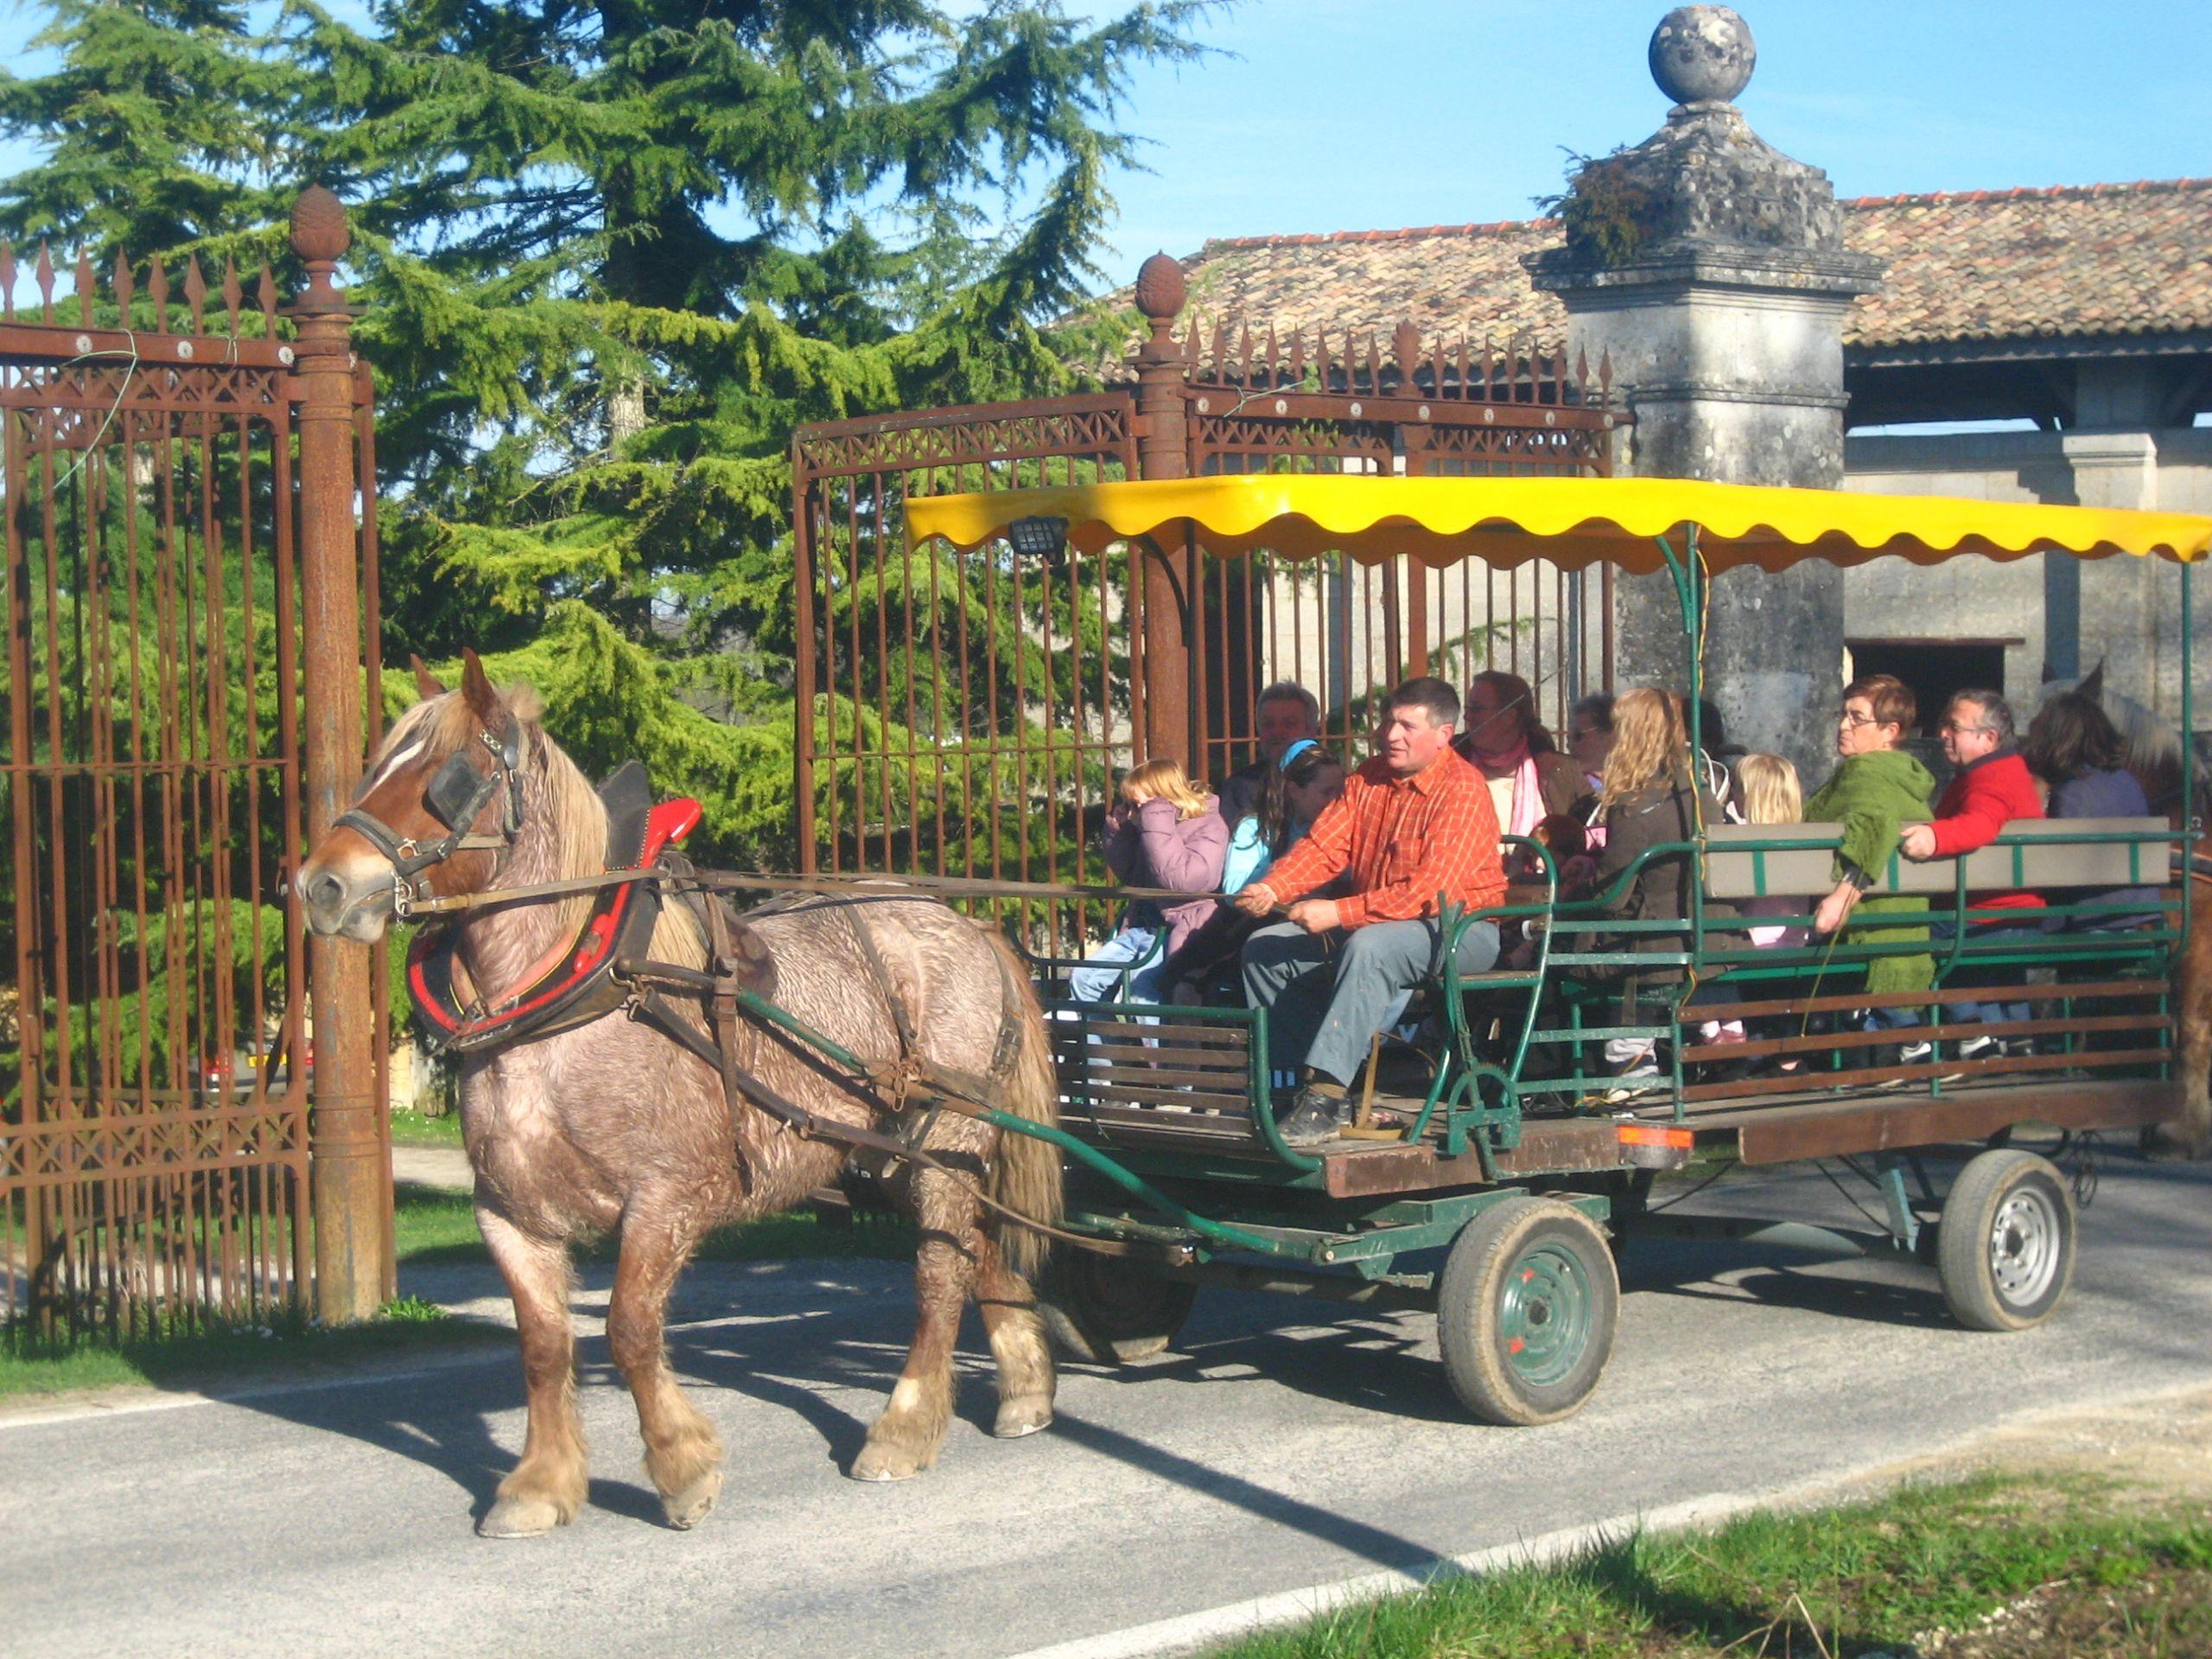 visite oenotourisme chateau de l'hurbe - balade